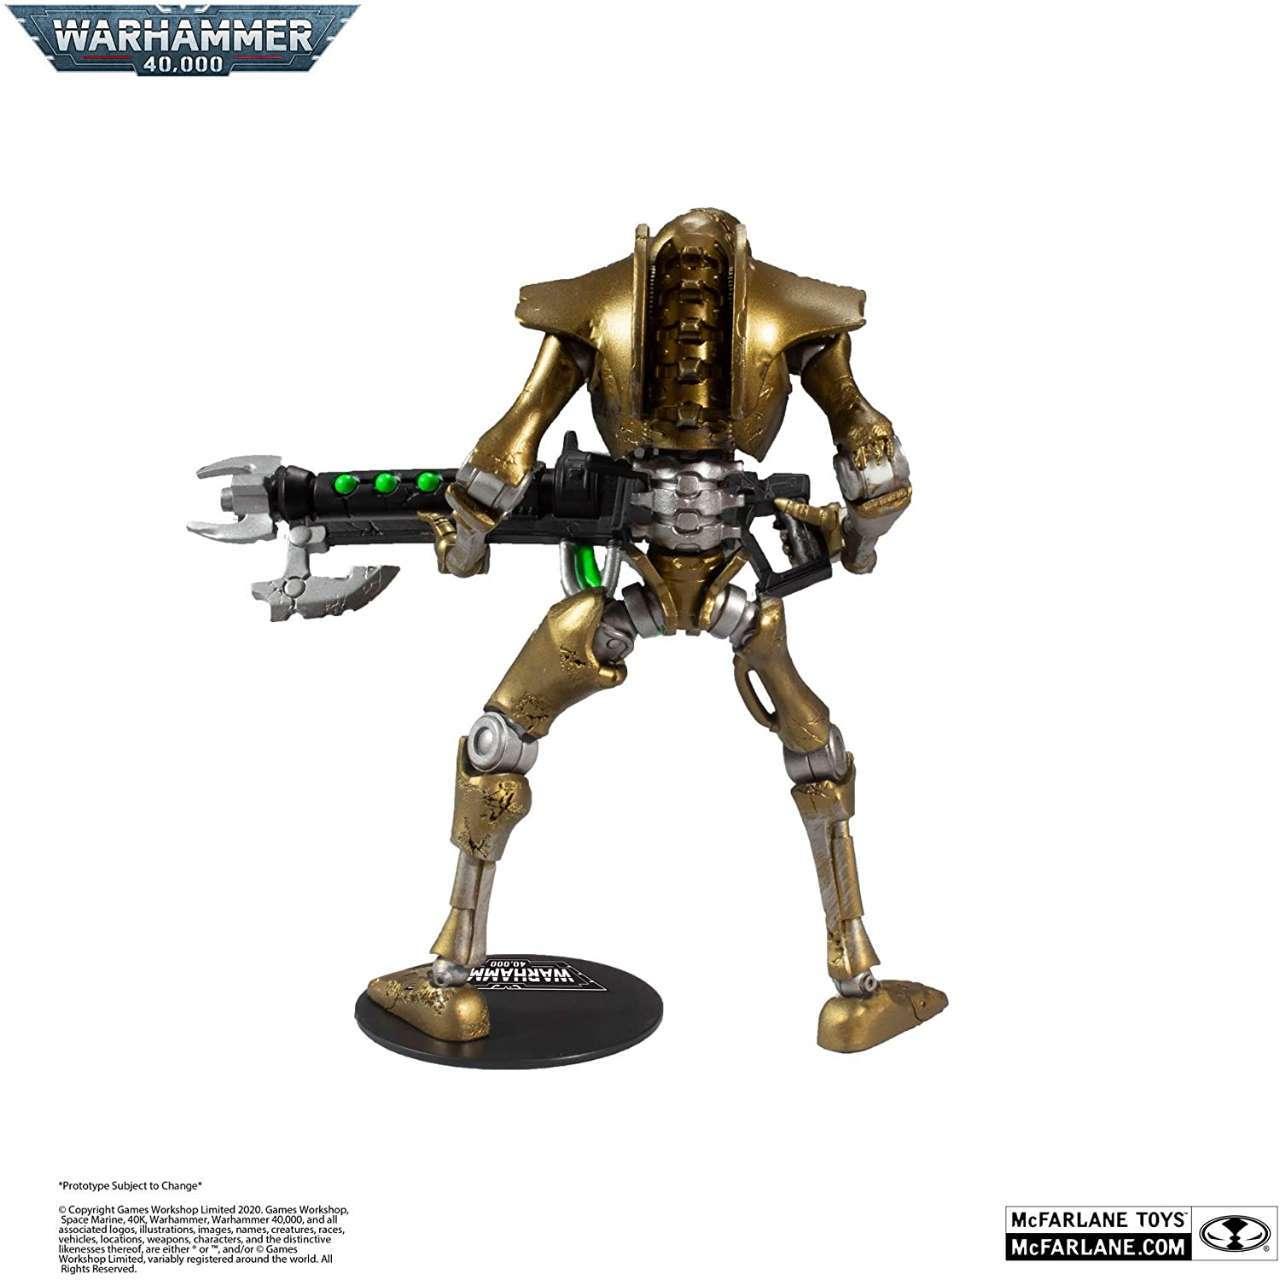 mcfarlane-warhammer-4000071HKELf-nlL_AC_SL1500_